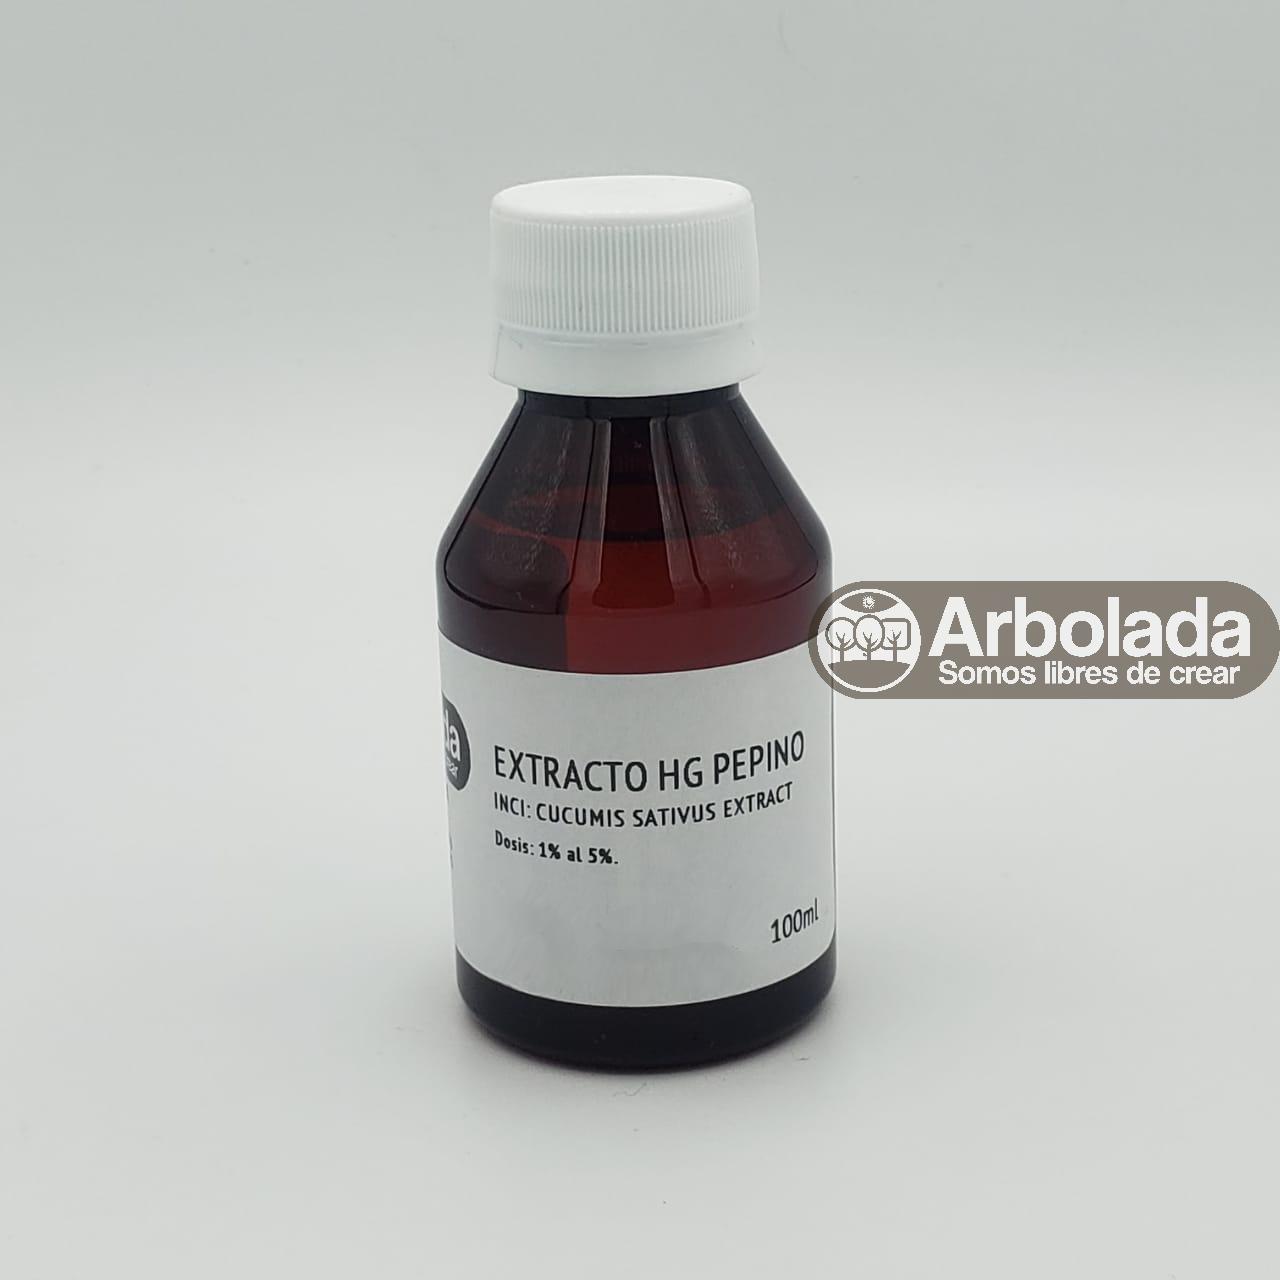 Extracto HG de Pepino 100ml